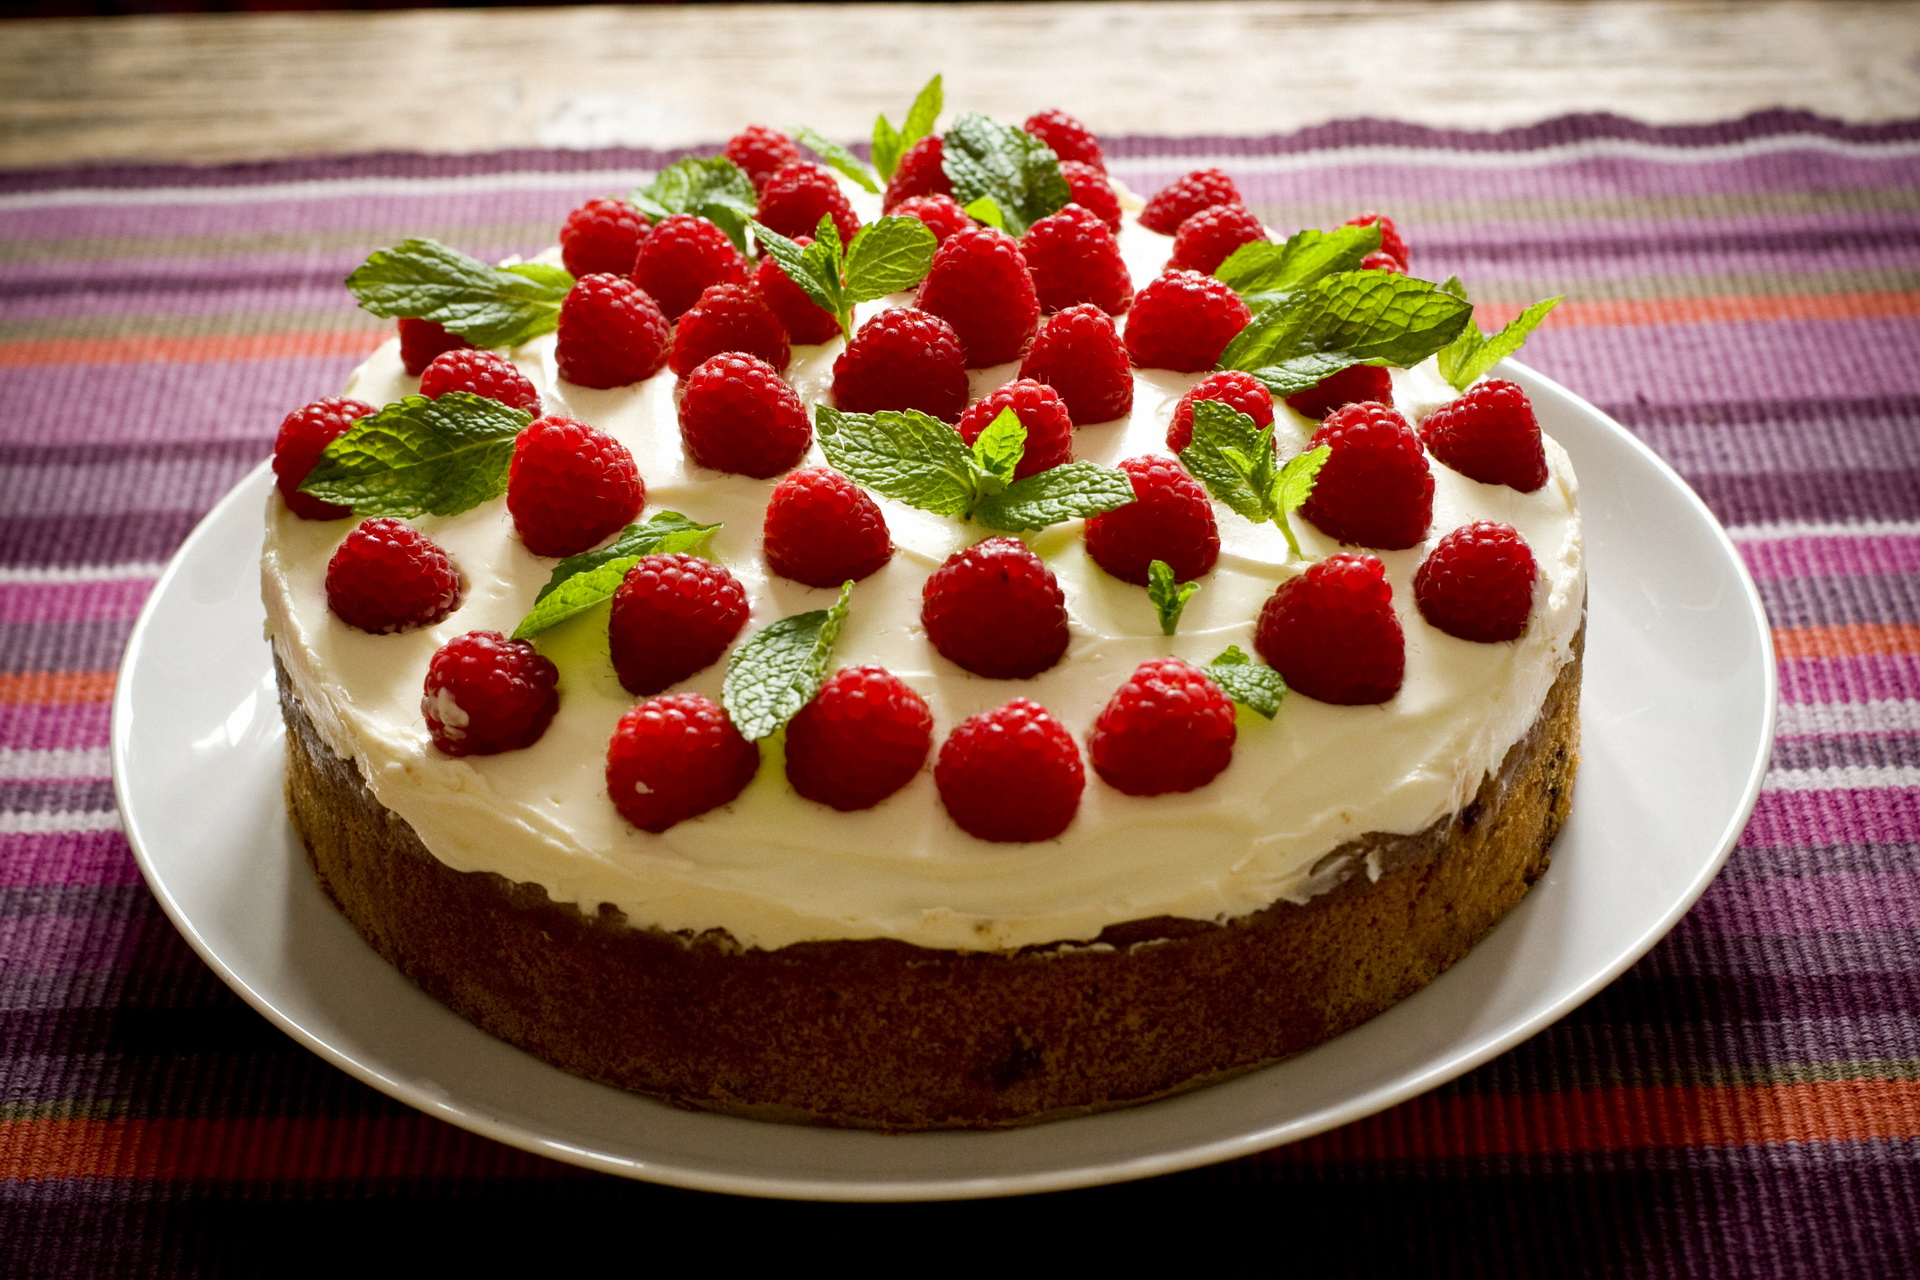 strawberry birthday cake recipe - HD1920×1200